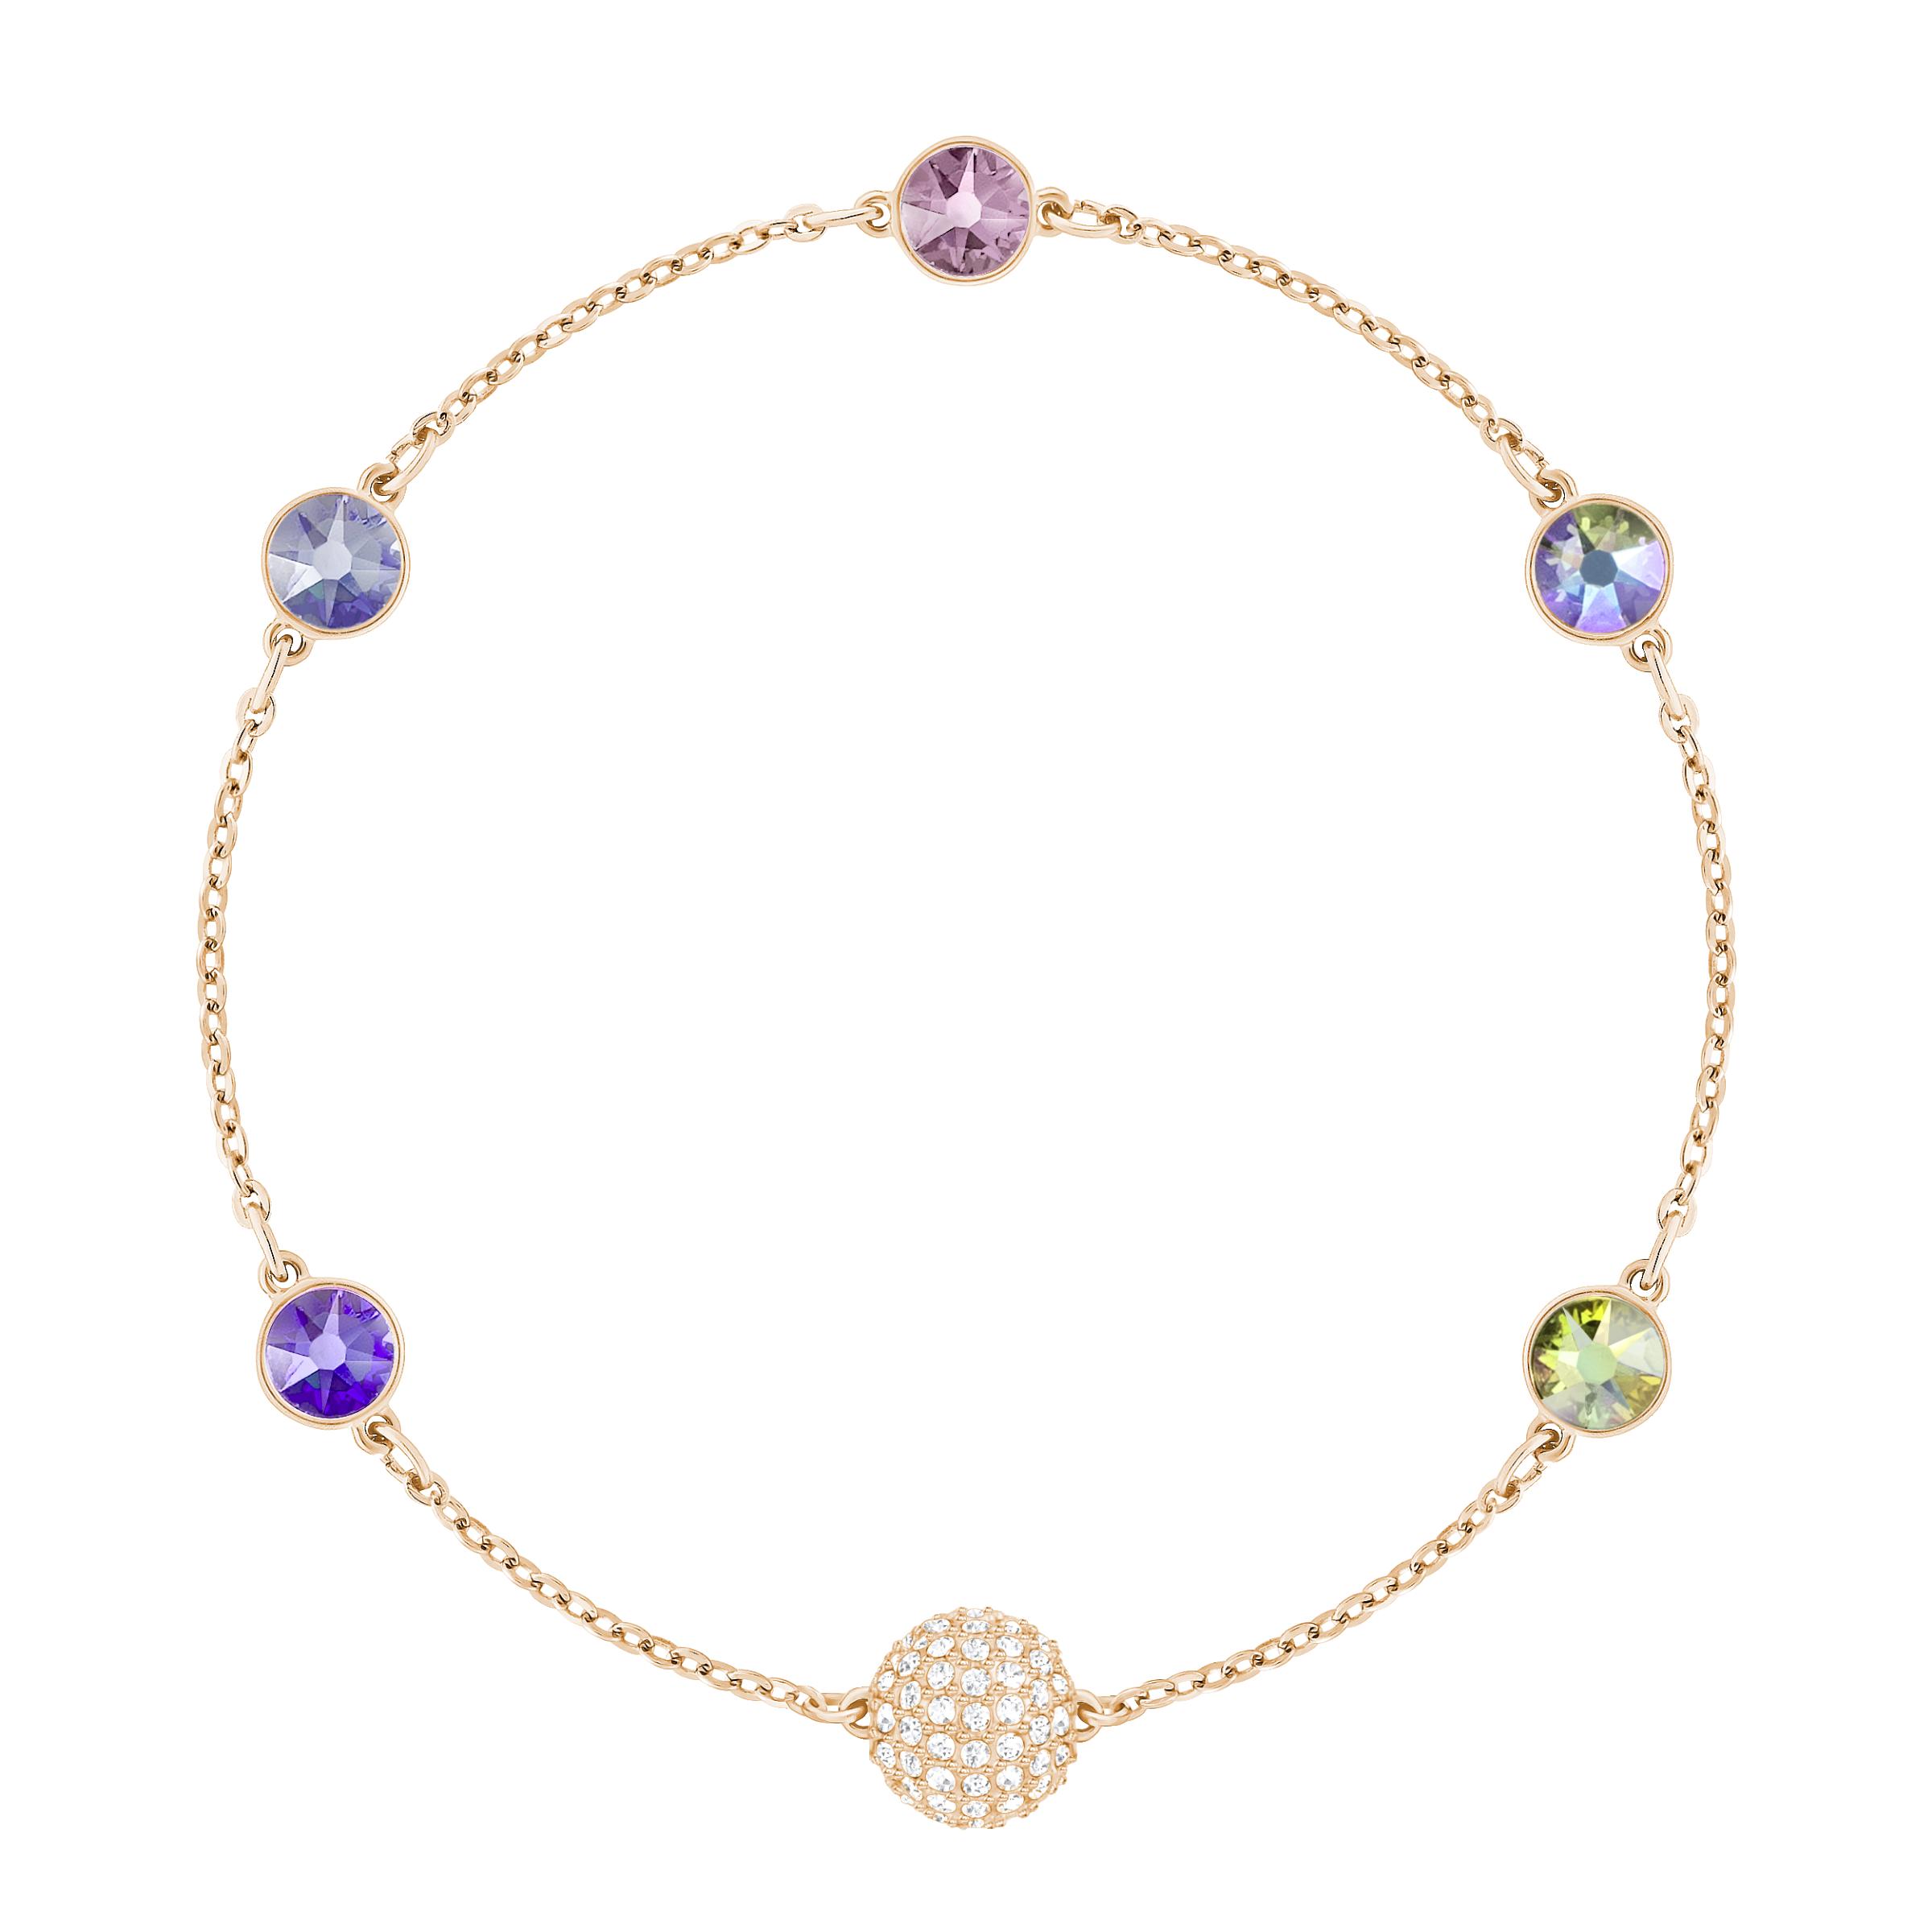 Swarovski Remix Collection Purple, Multi-Colored, Rose Gold Plating